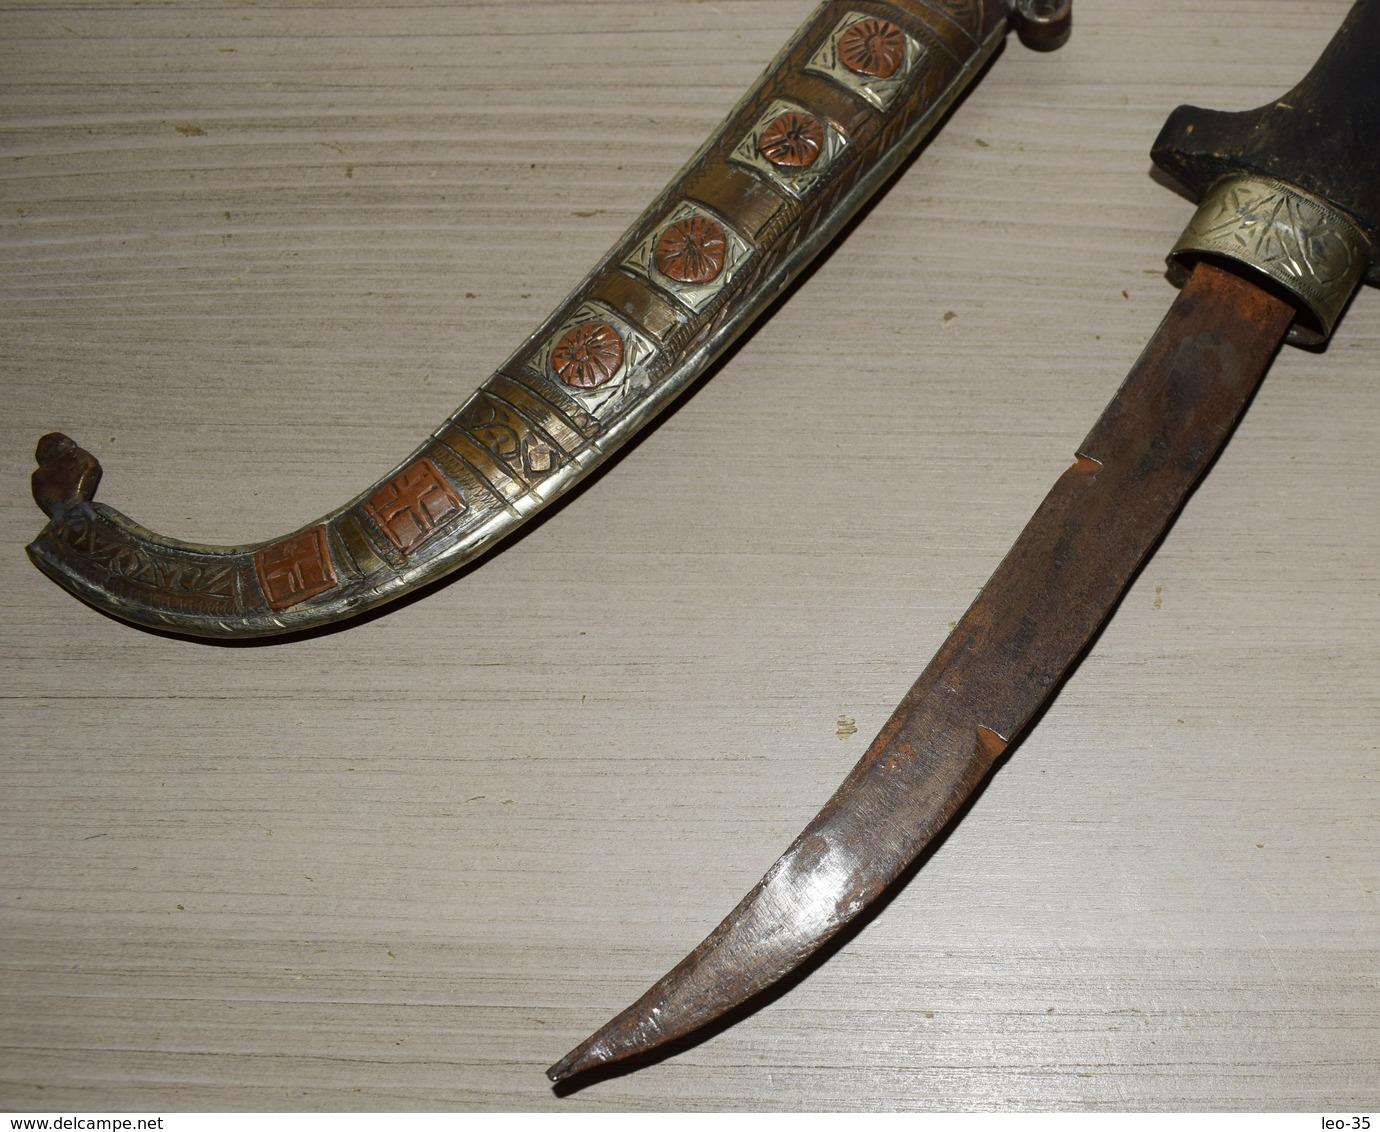 Couteau Poignard Marocain KOUMIA Fourreau En Métal Ciselé - 31.5 Cm - Knives/Swords